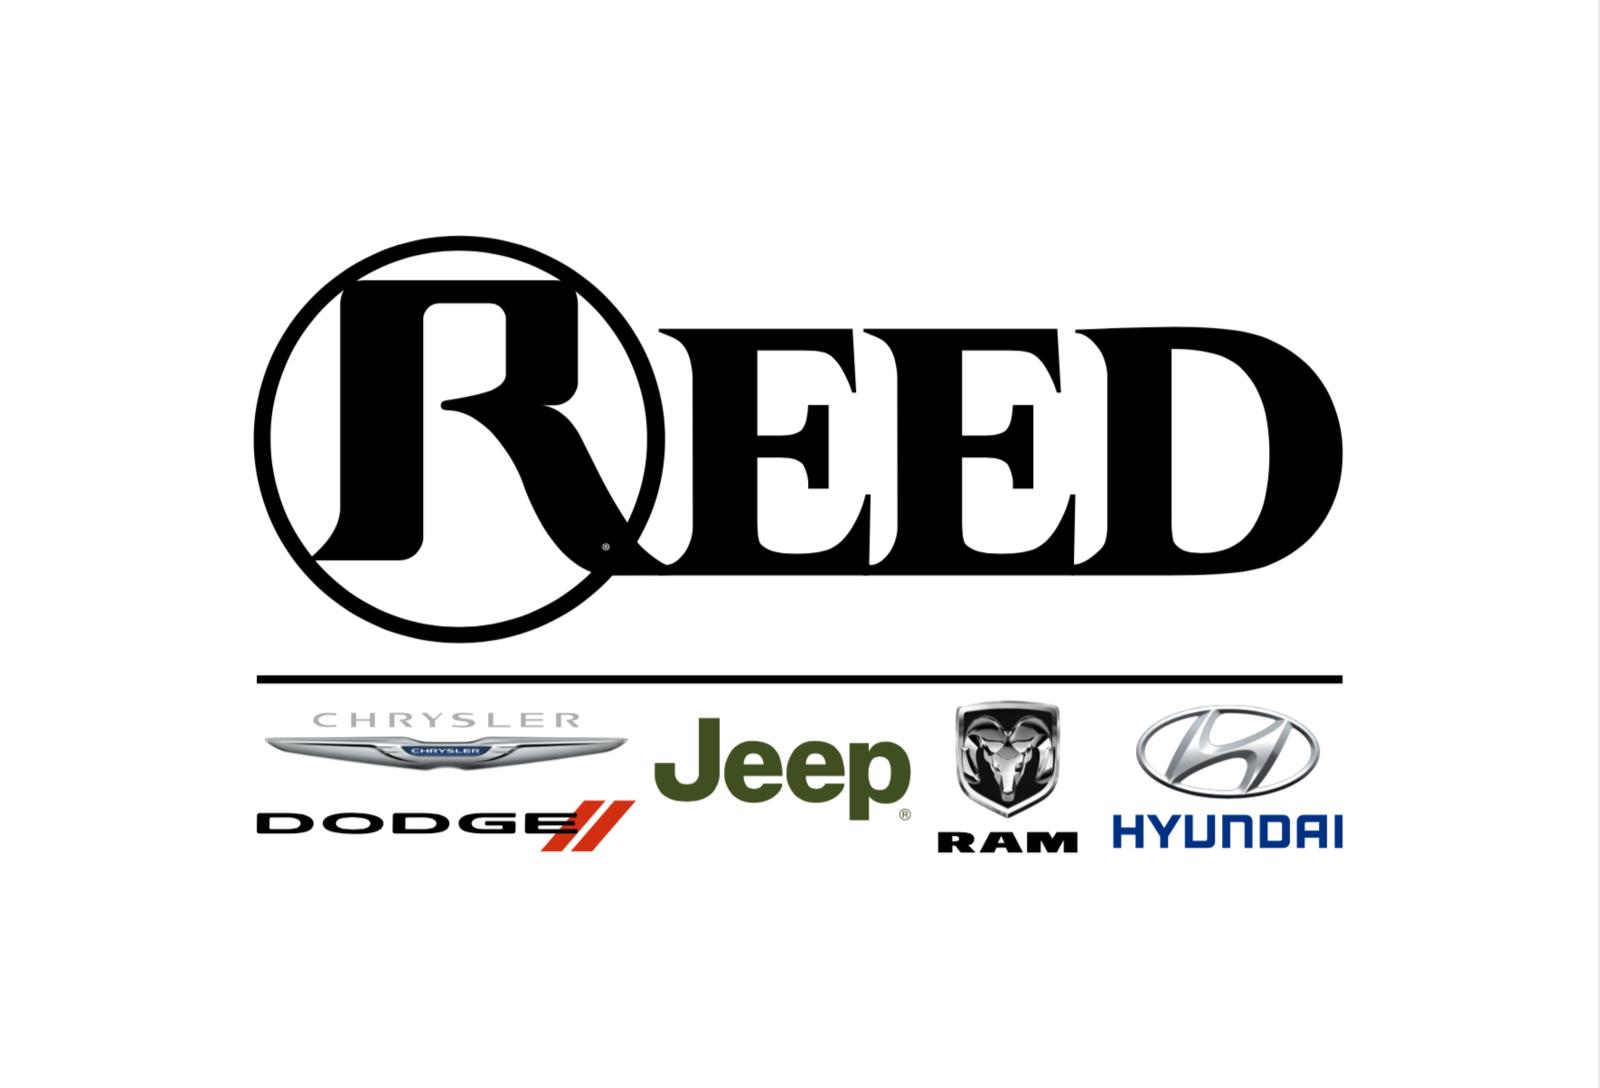 reed chrysler dodge jeep ram hyundai